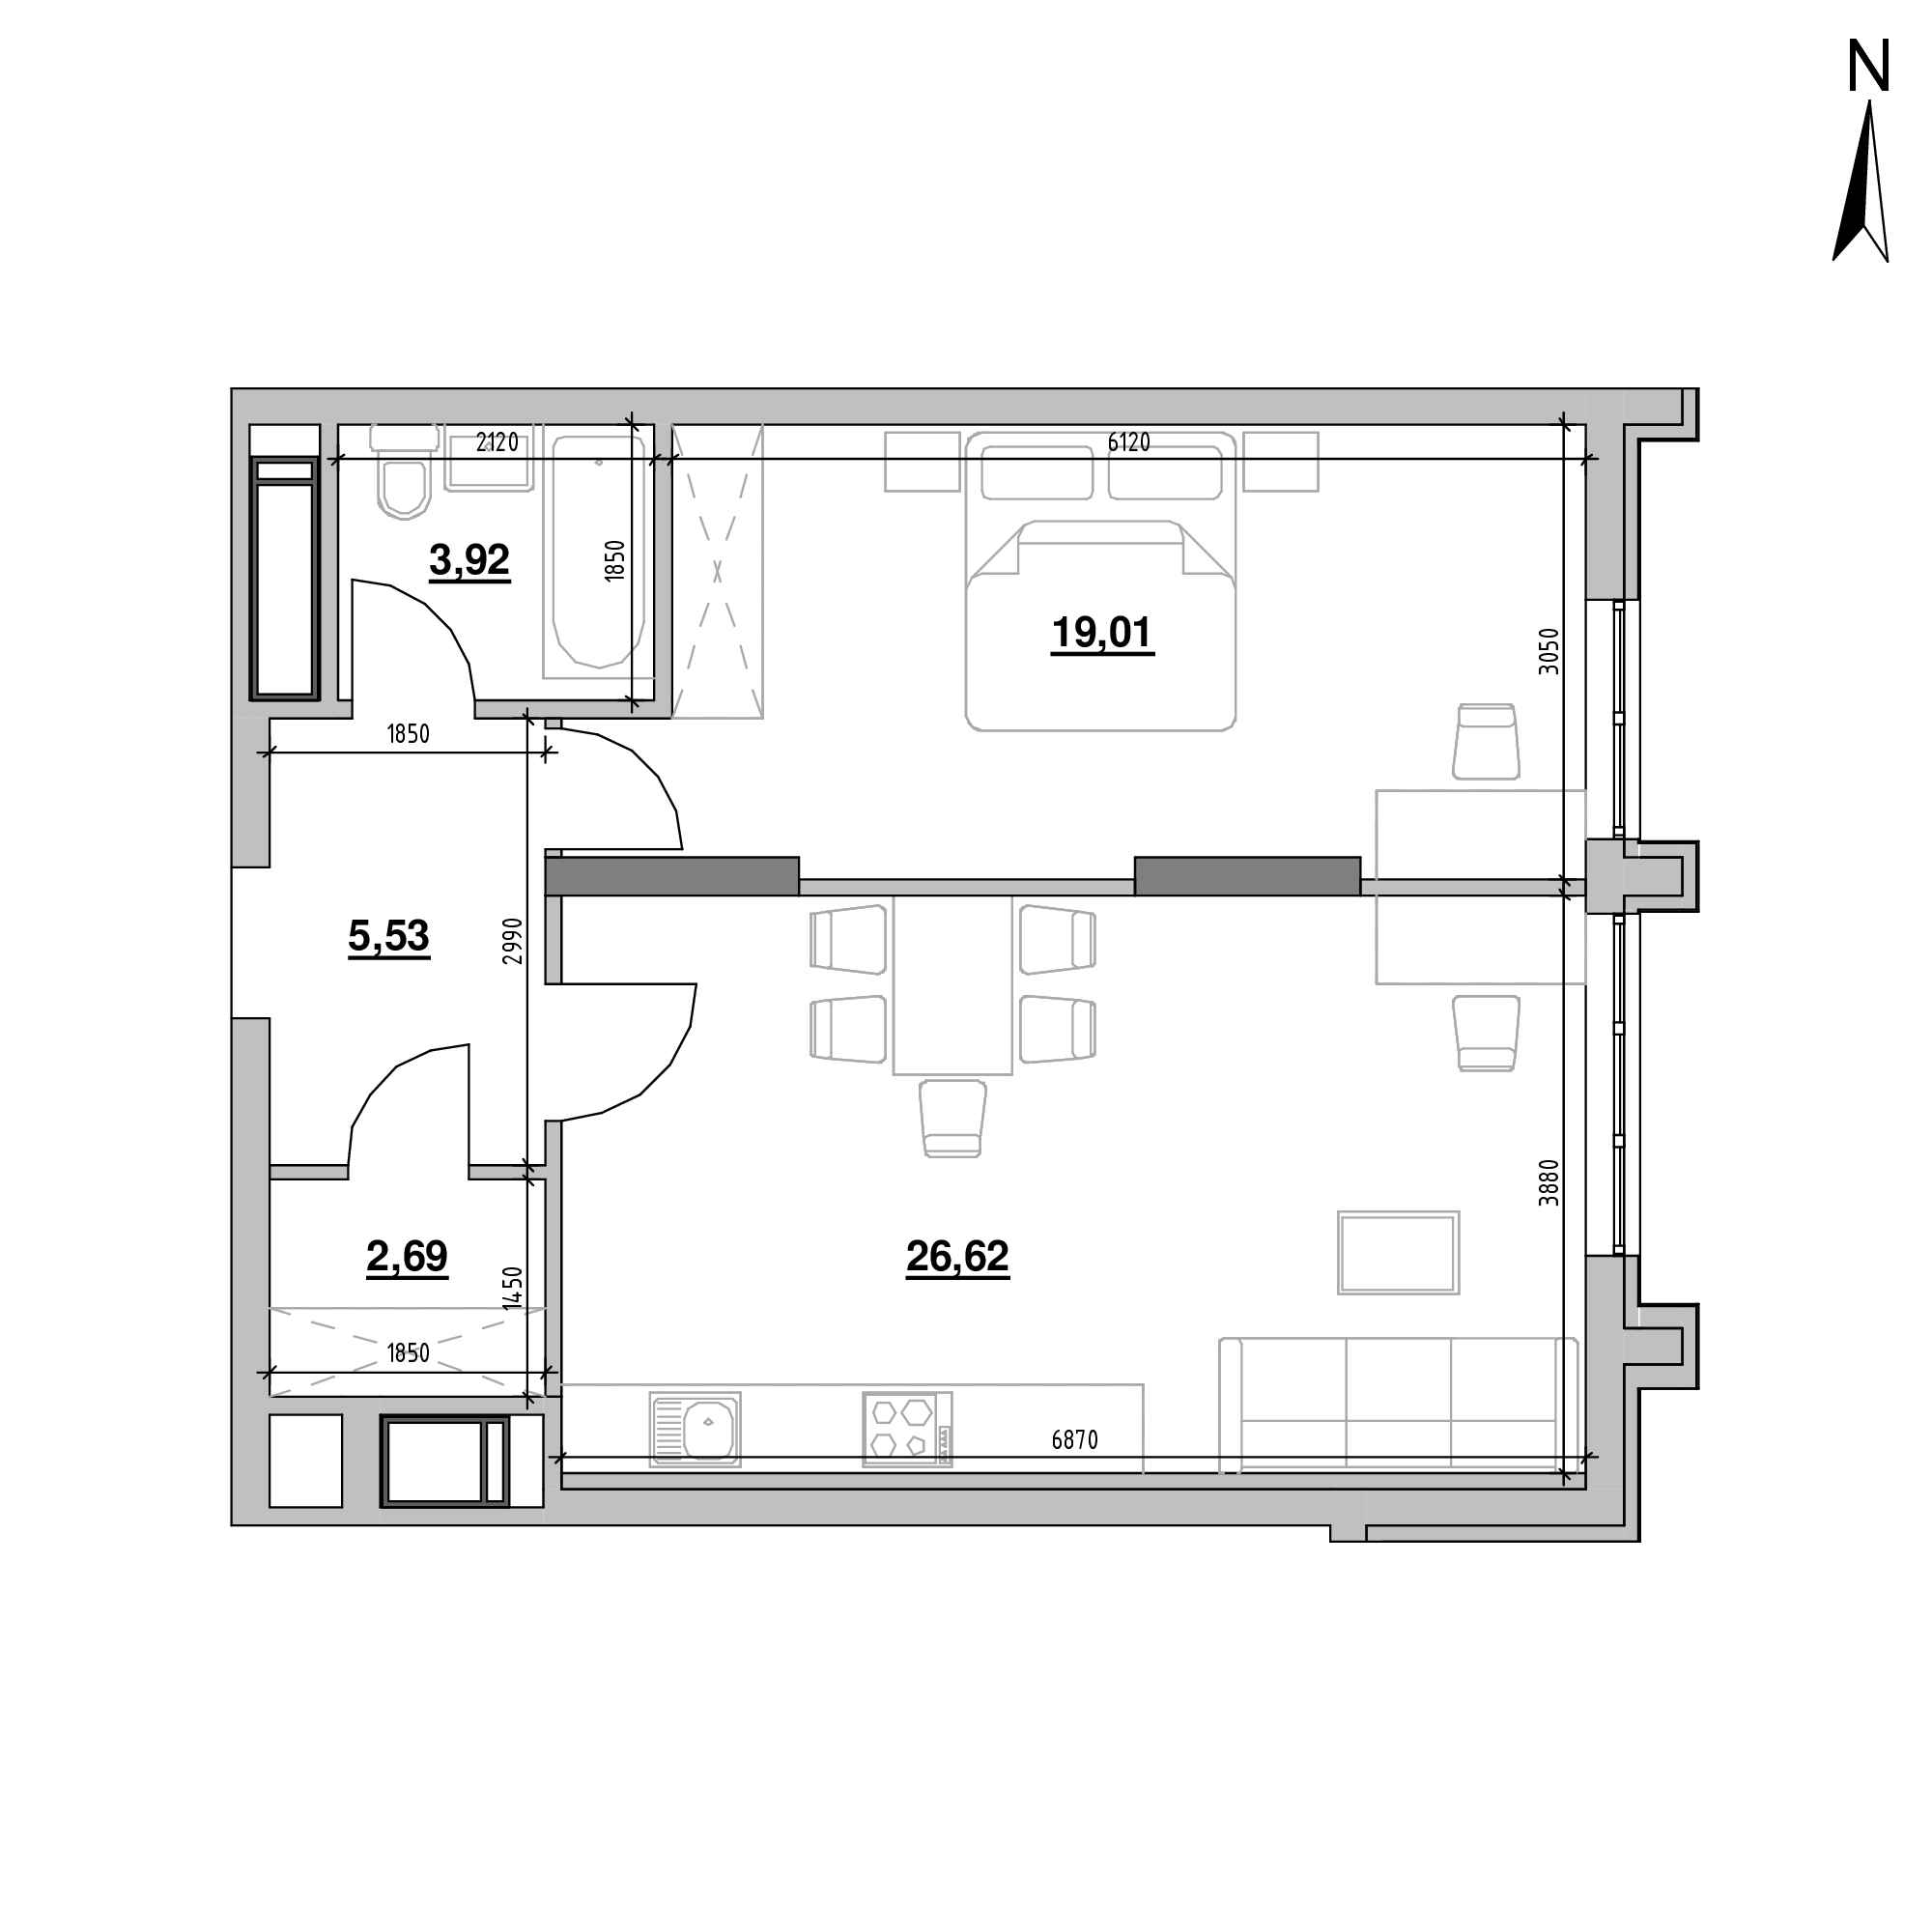 ЖК Nordica Residence: планування 1-кімнатної квартири, №153, 57.77 м<sup>2</sup>